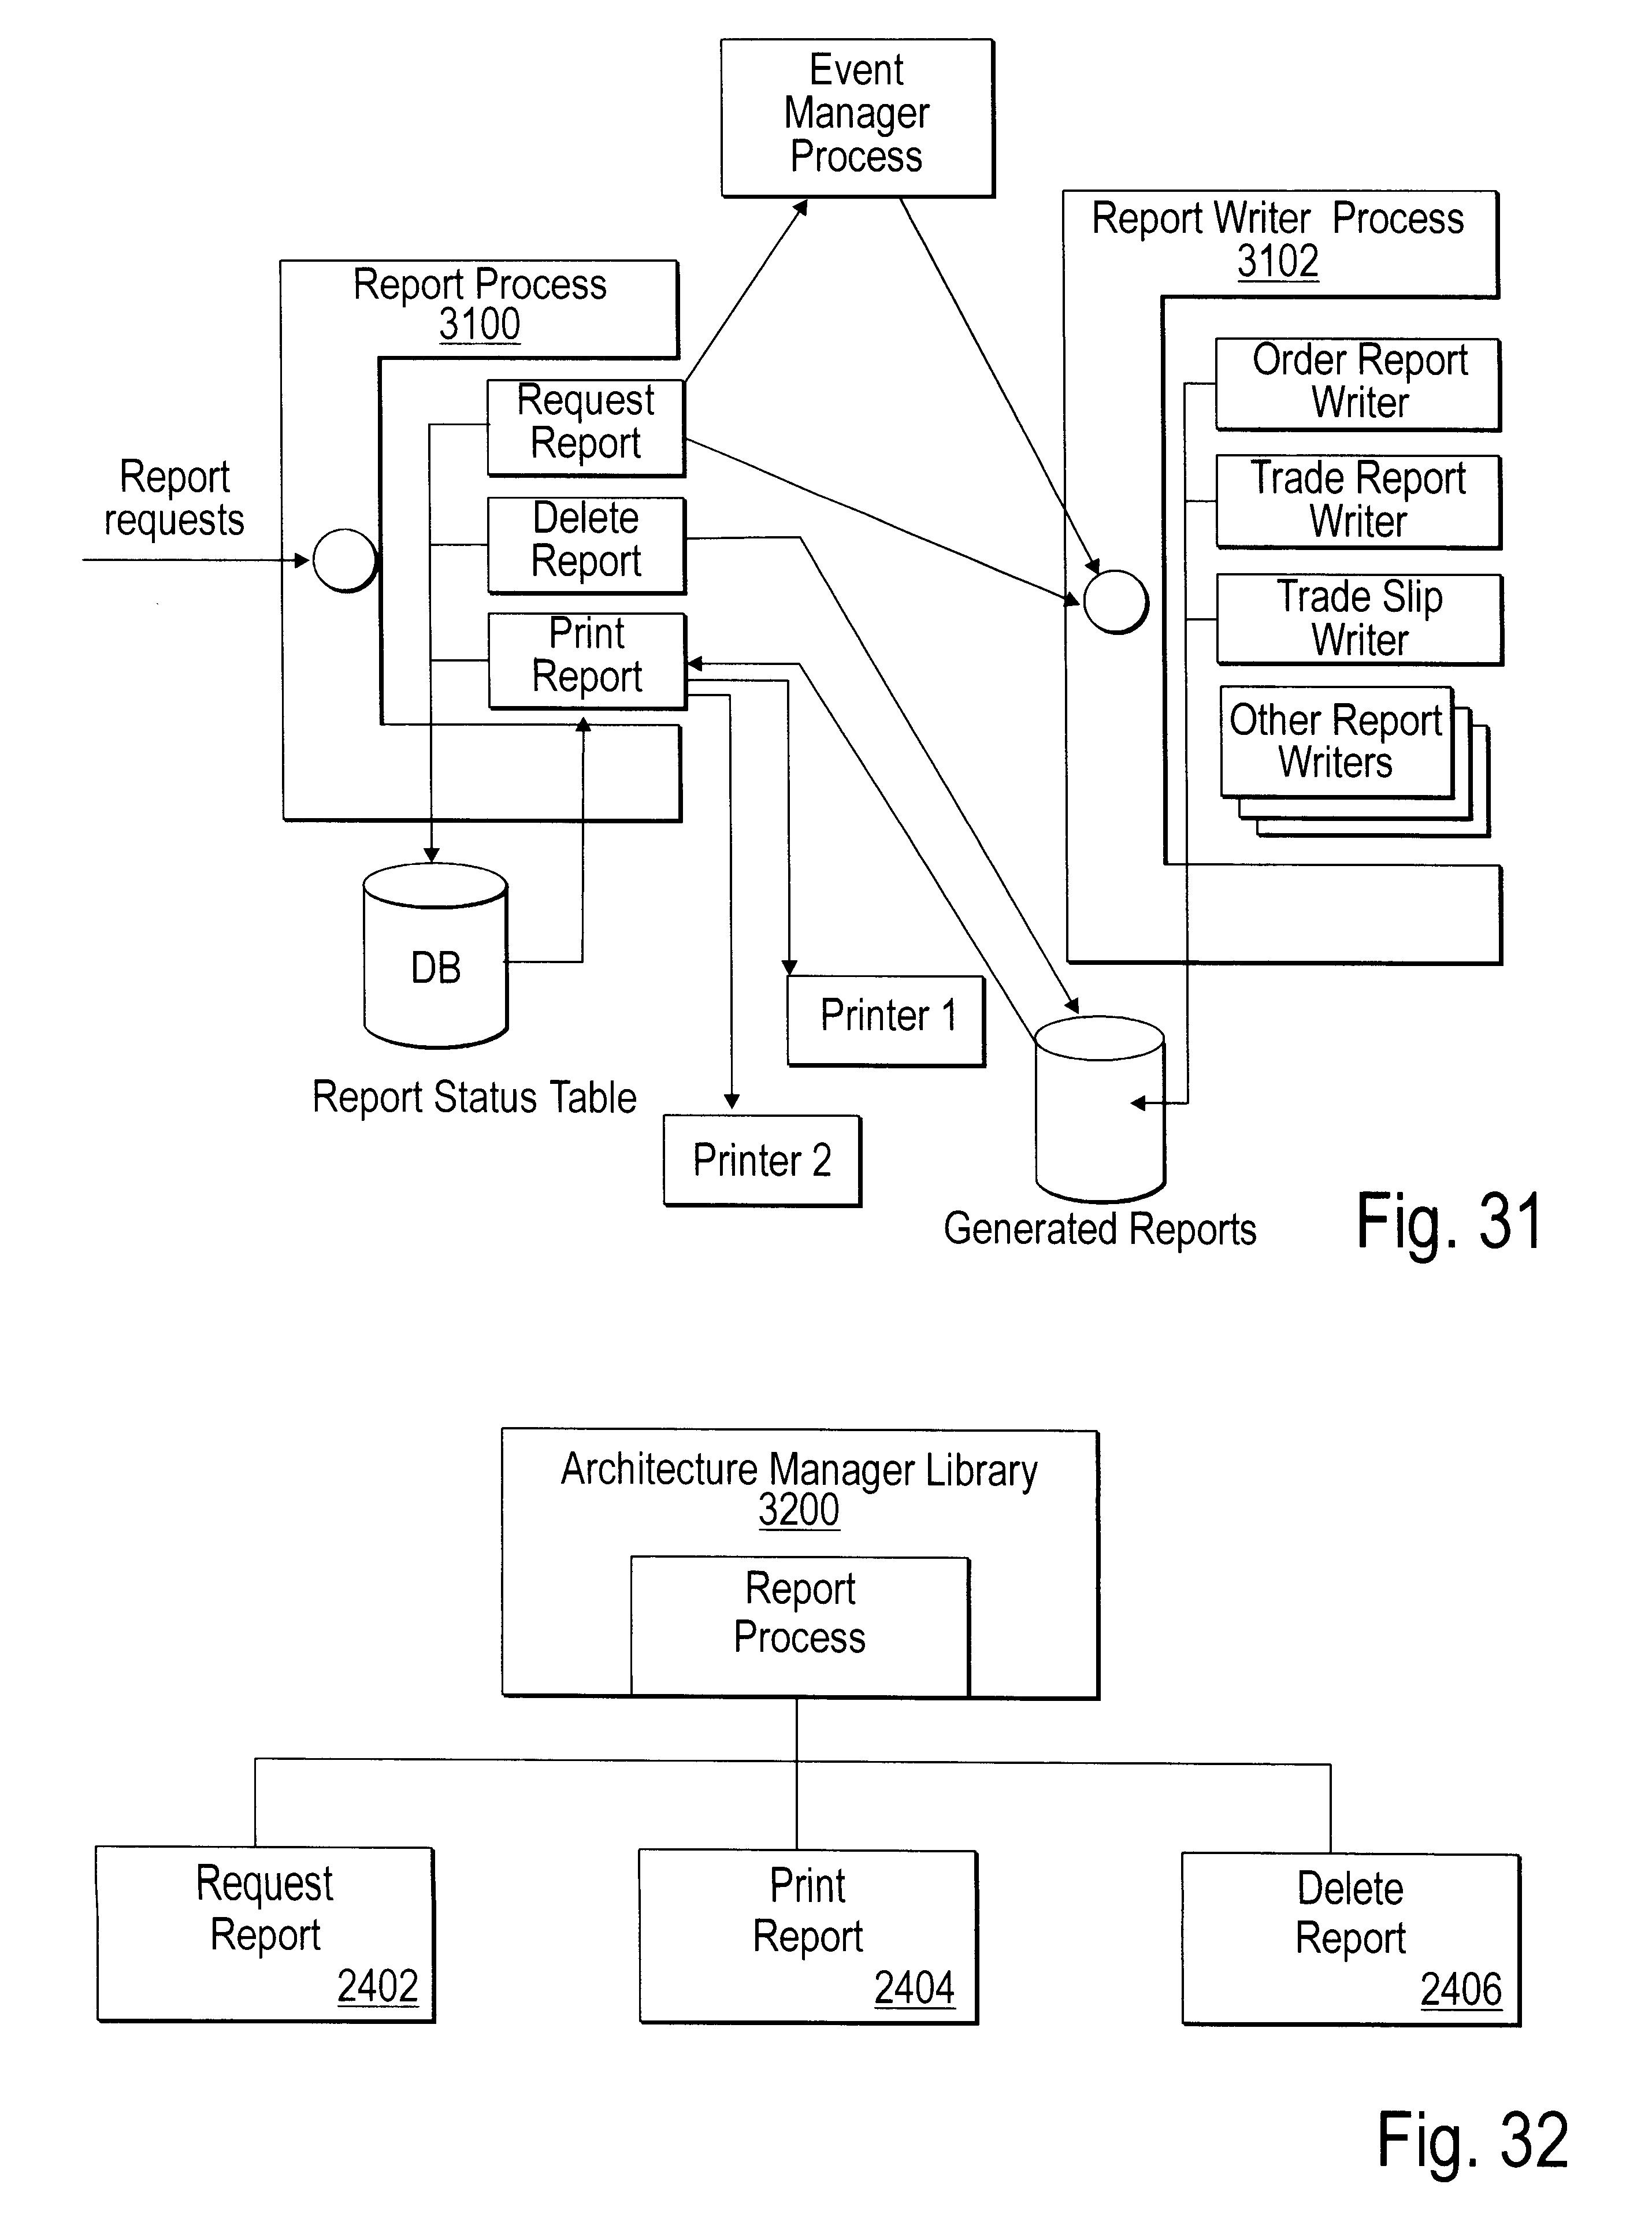 Patent Us 6332163 B1 Visio Circuit Schematic Symbols With The Amateur Radio Relay Images